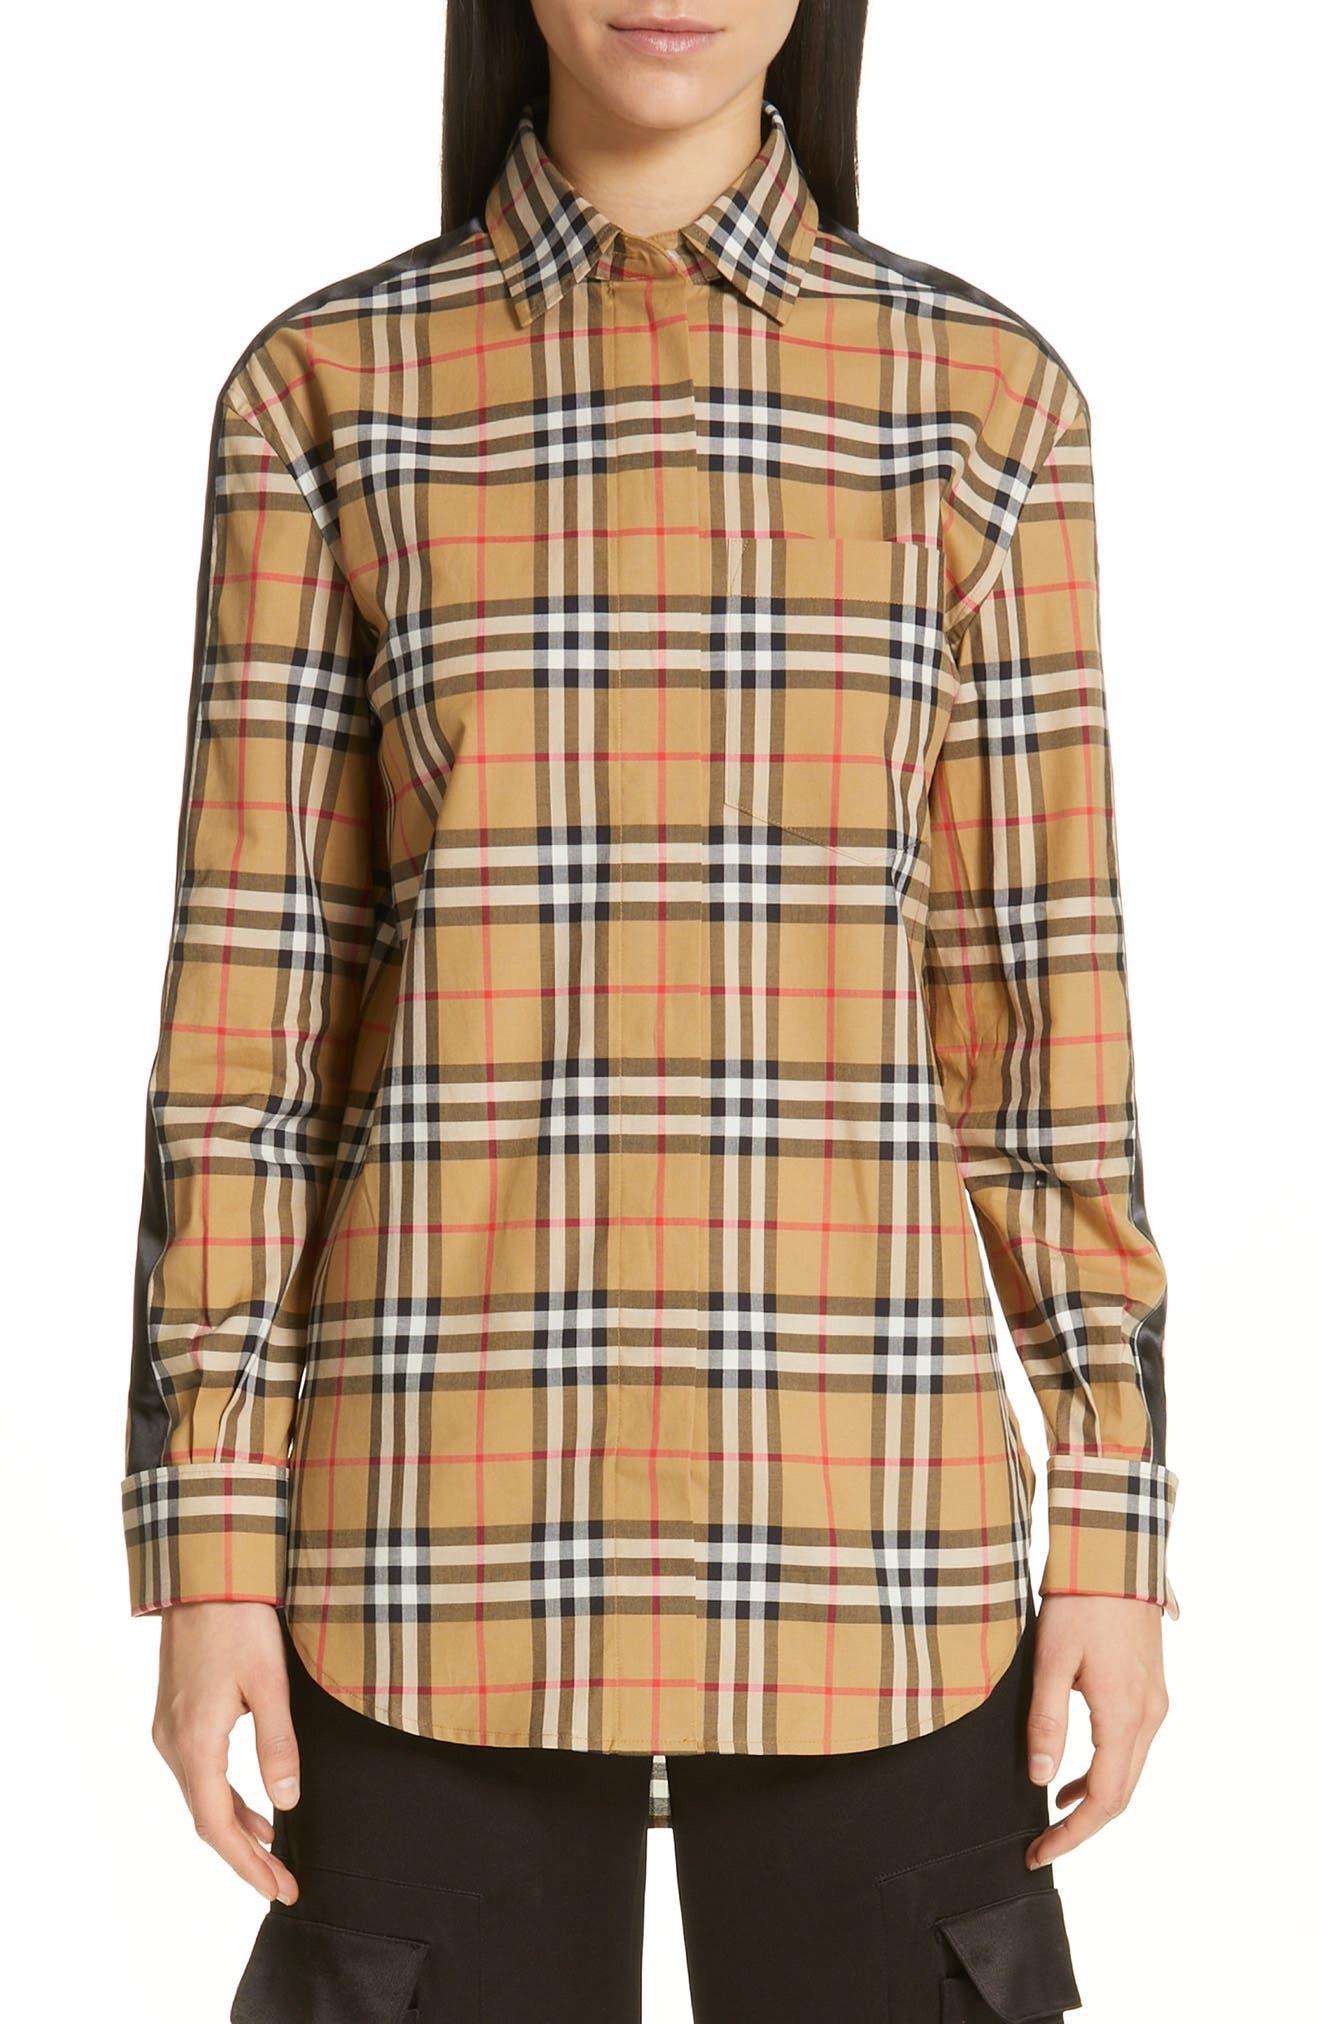 BURBERRY, Saoirse Vintage Check Cotton Shirt, Main thumbnail 1, color, ANTIQUE YELLOW CHECK